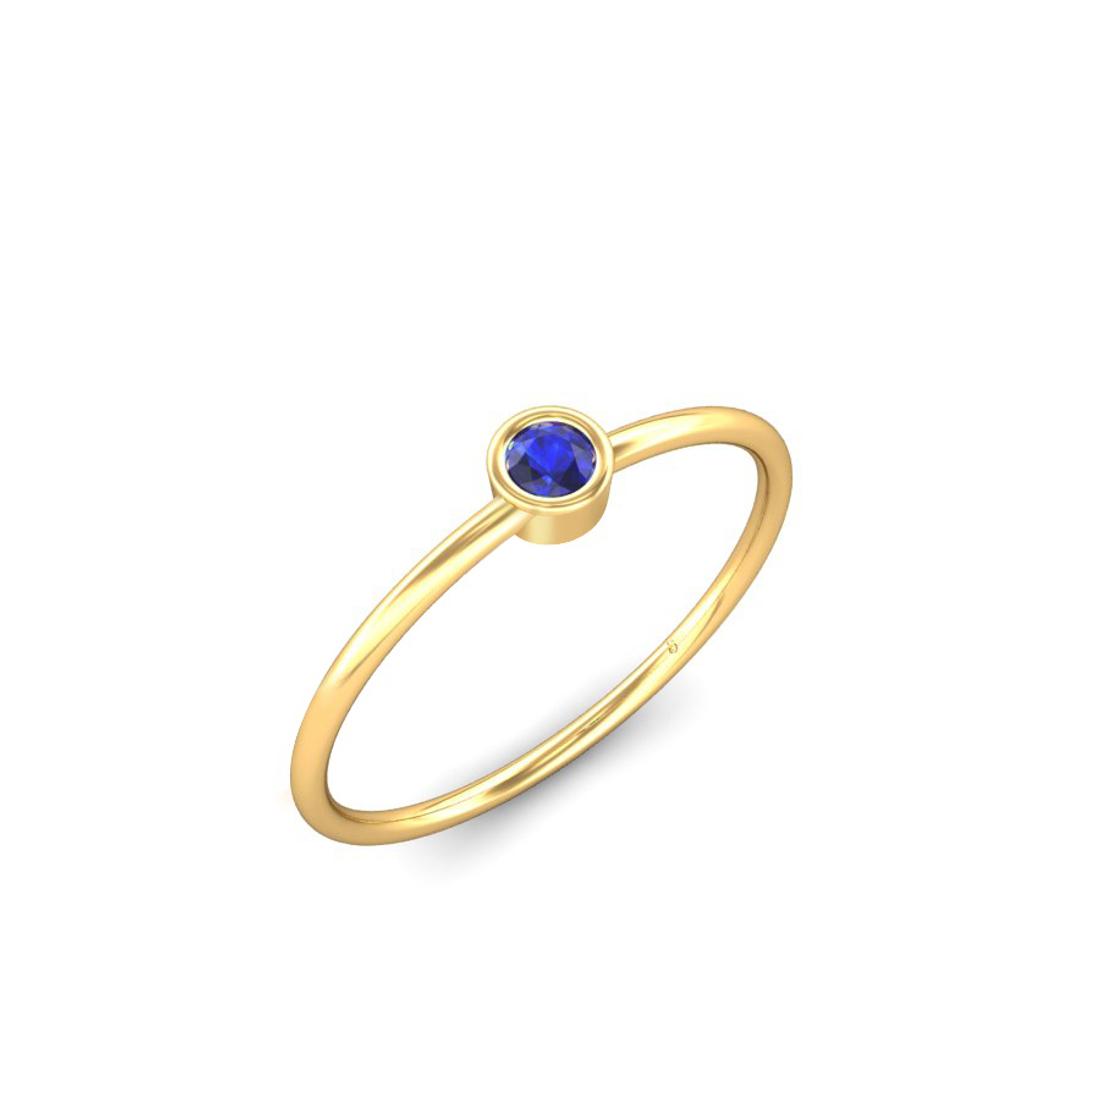 Jewel samarth 18k(750) BIS Hallmark Yellow Gold Nivya Iolite Ring (CGL Certified)